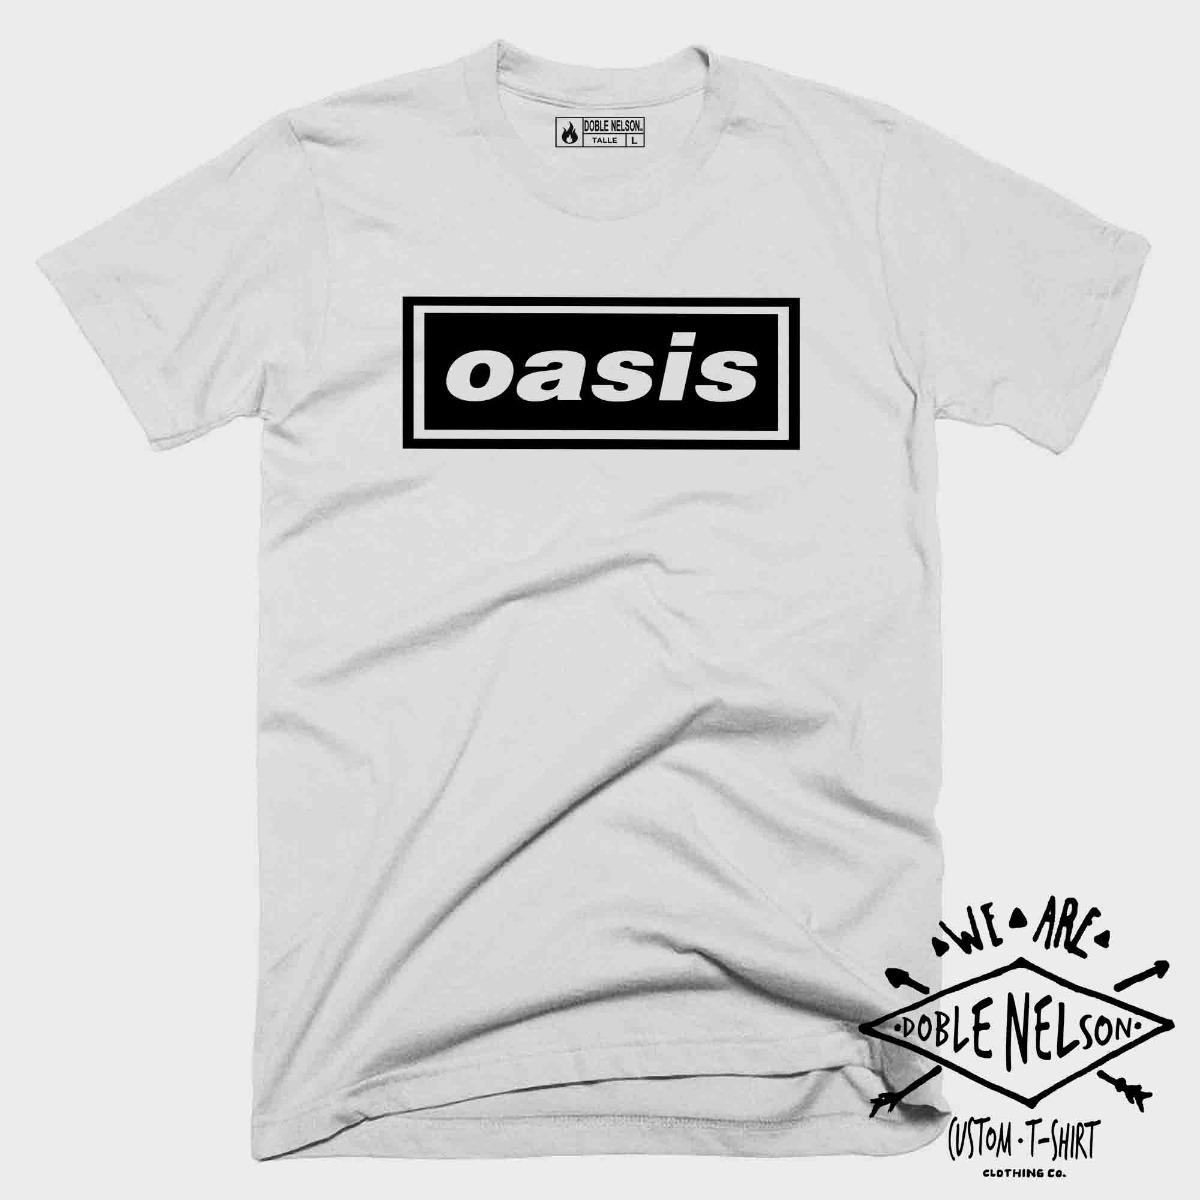 Oasis Camiseta Remera Hombre Doble Nelson Rock yIY6g7vfbm